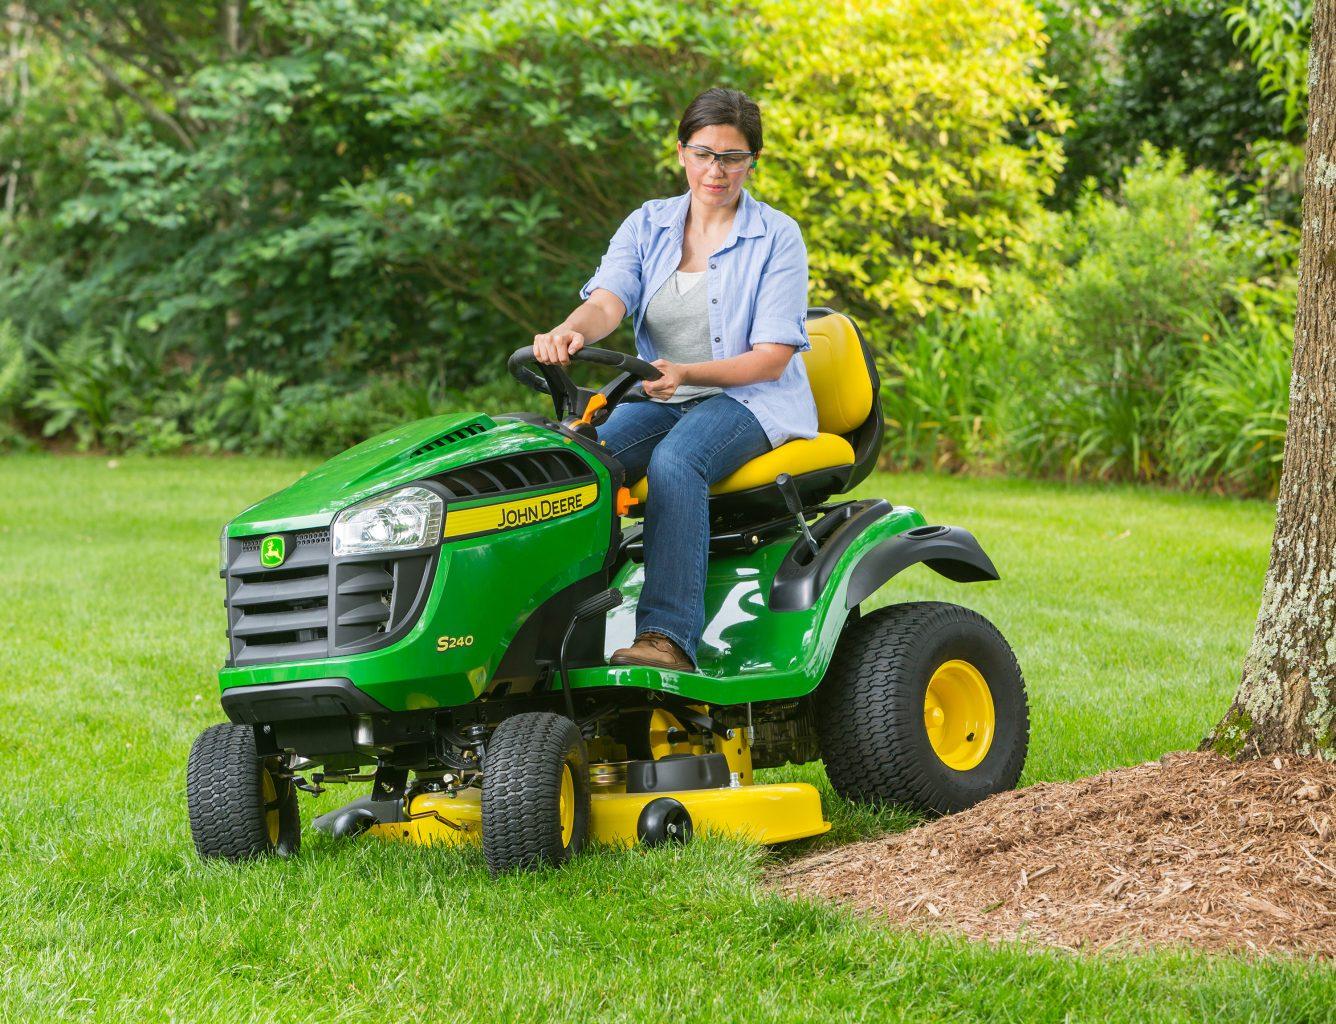 Rather Hustler sport lawnmower specifications